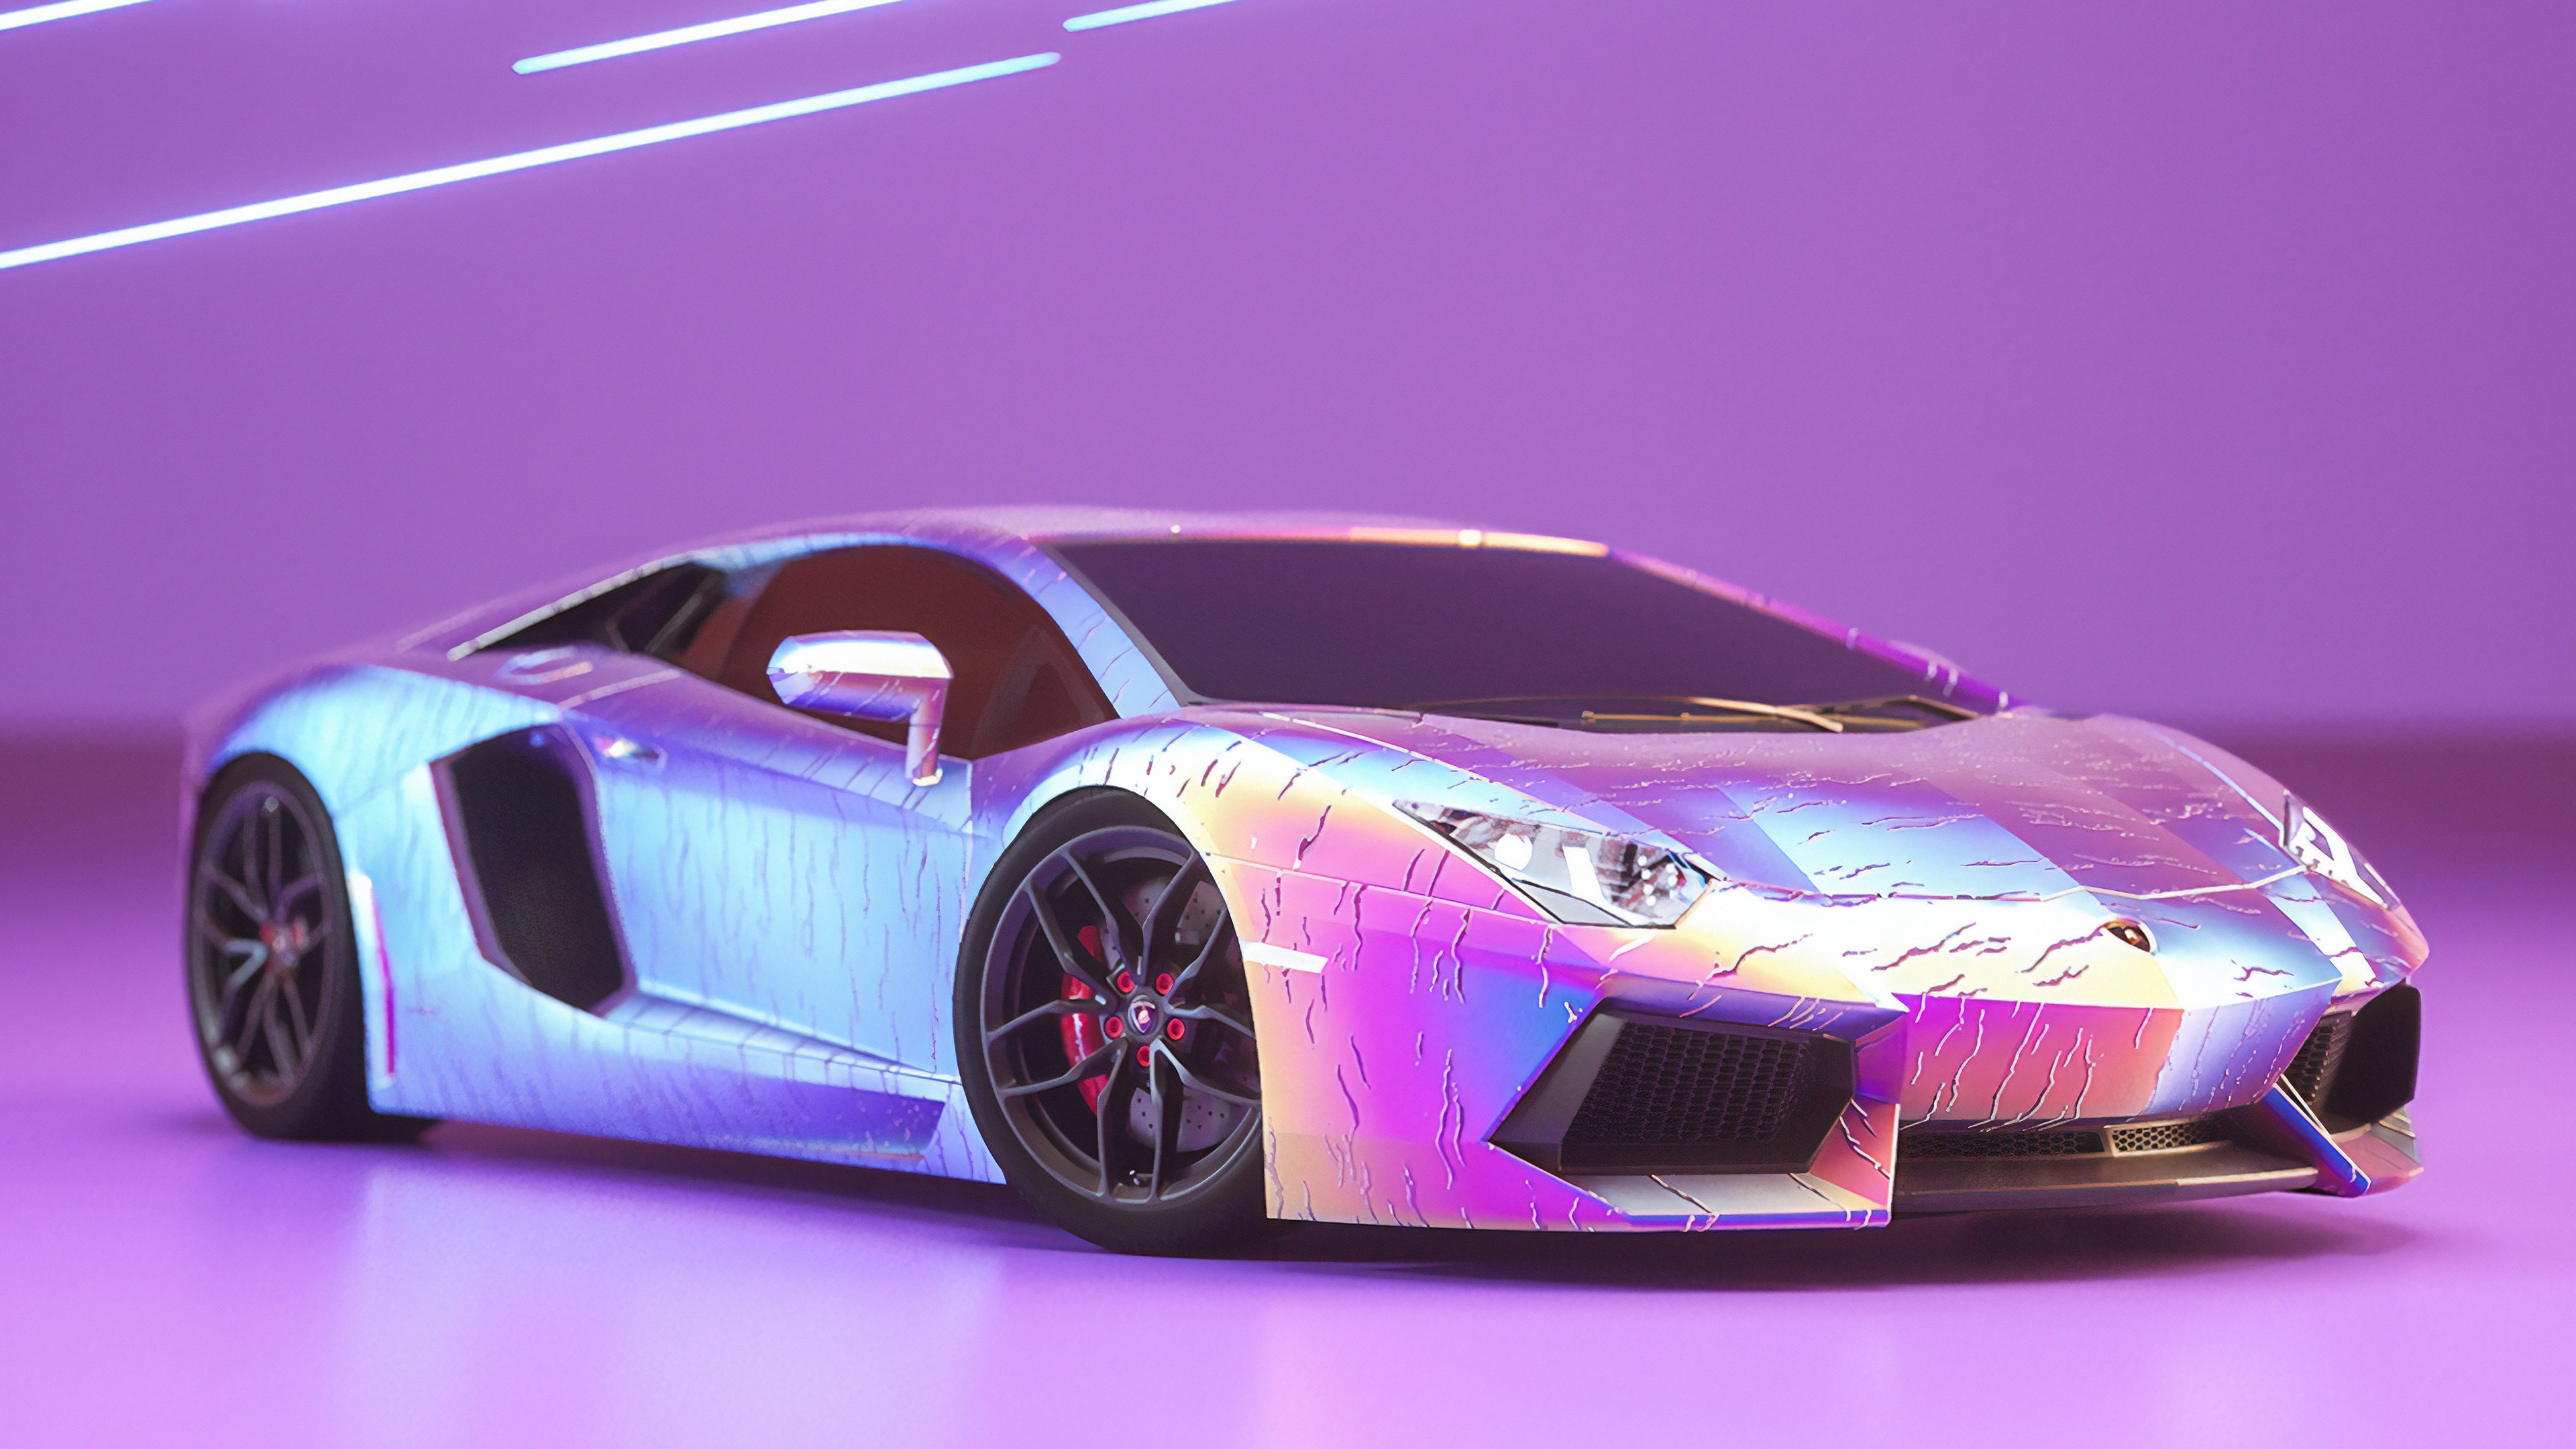 lamborghini aventador new front 1570919095 - Lamborghini Aventador New Front - lamborghini aventador wallpapers, hd-wallpapers, cars wallpapers, behance wallpapers, 4k-wallpapers